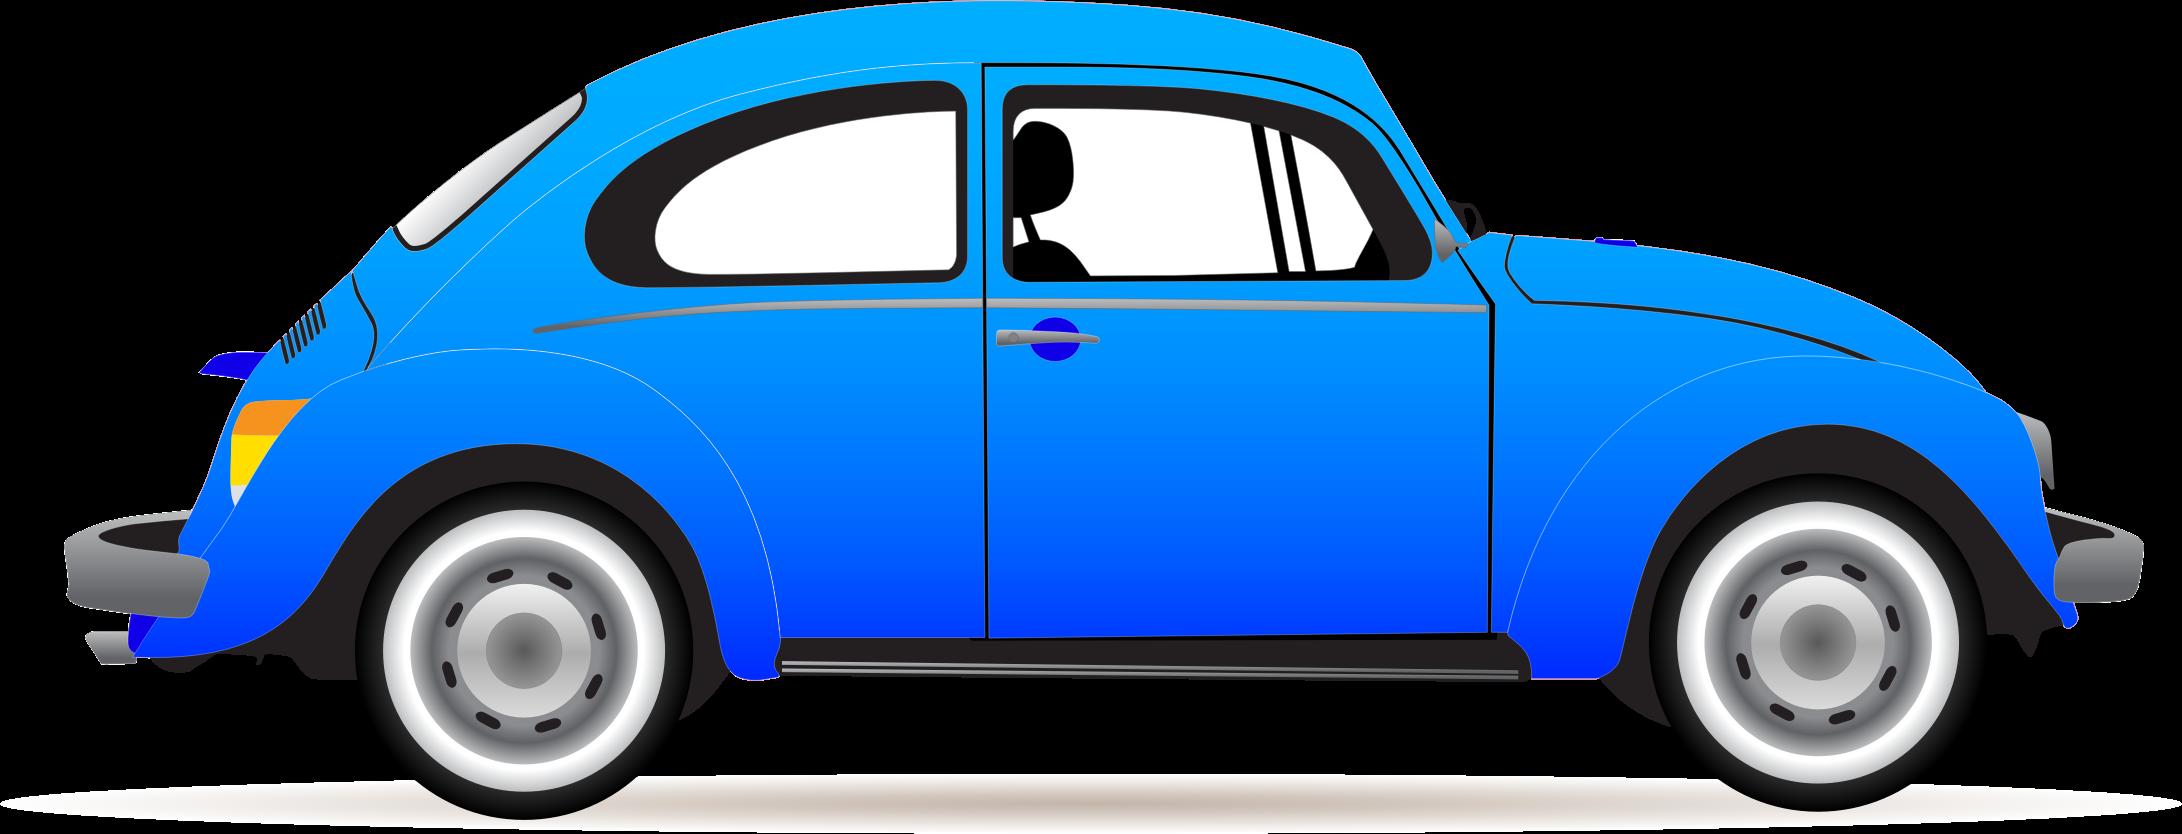 Car clipart #4, Download drawings